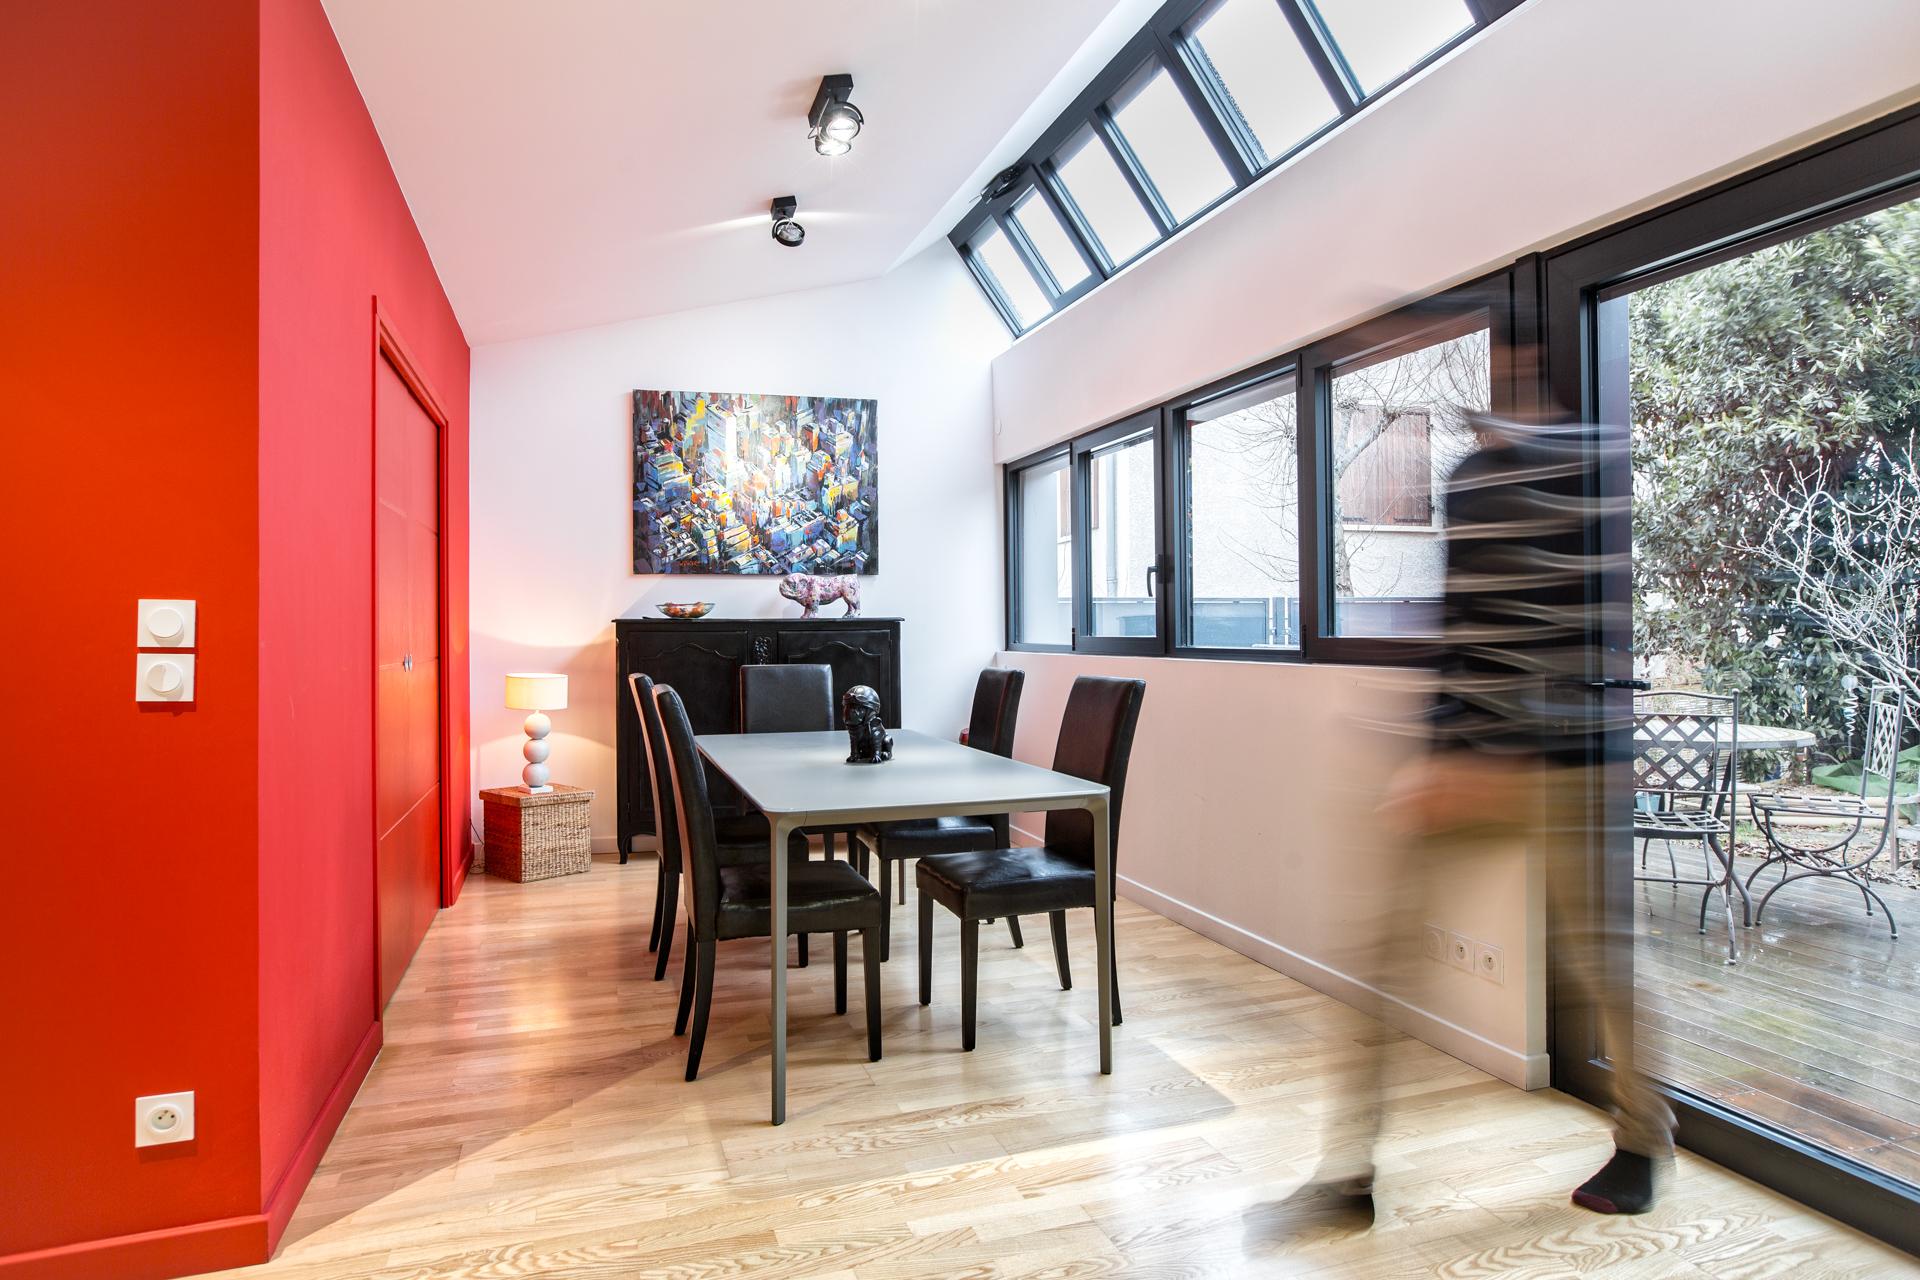 human architecte extension shed low res 3 human architecteshuman architectes. Black Bedroom Furniture Sets. Home Design Ideas